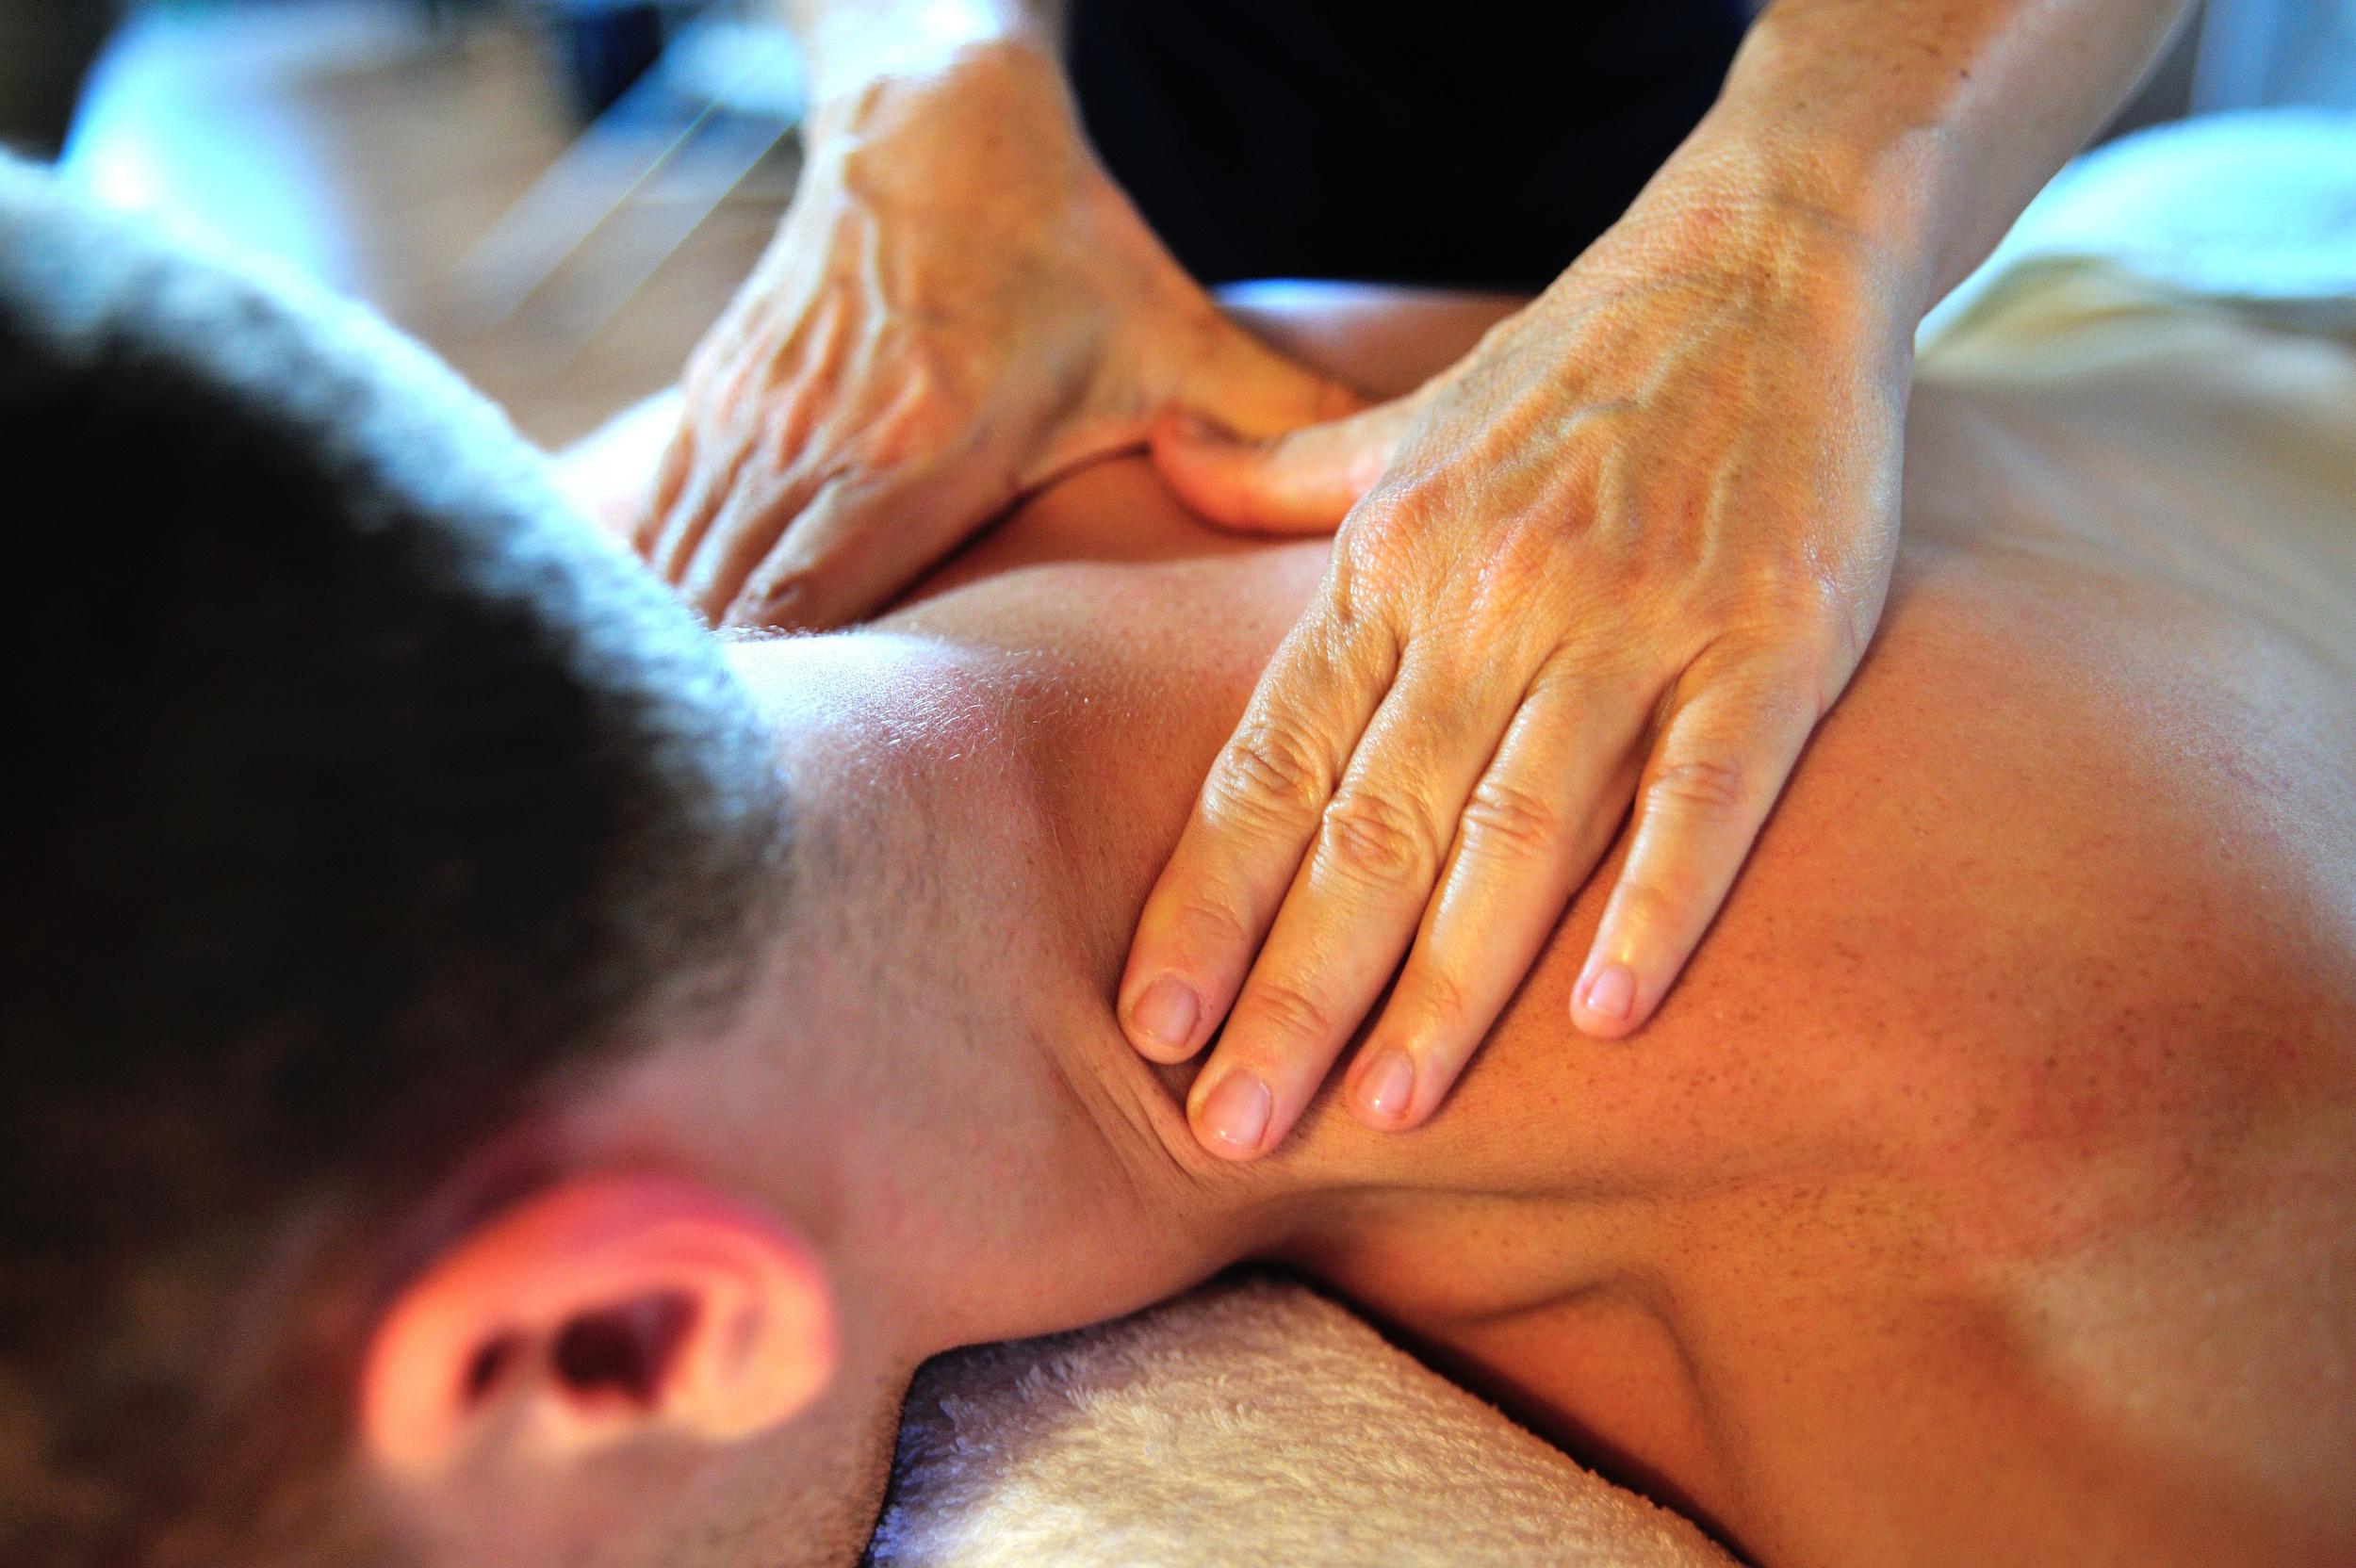 massage-therapist-in-Longmont-Colorado.jpg